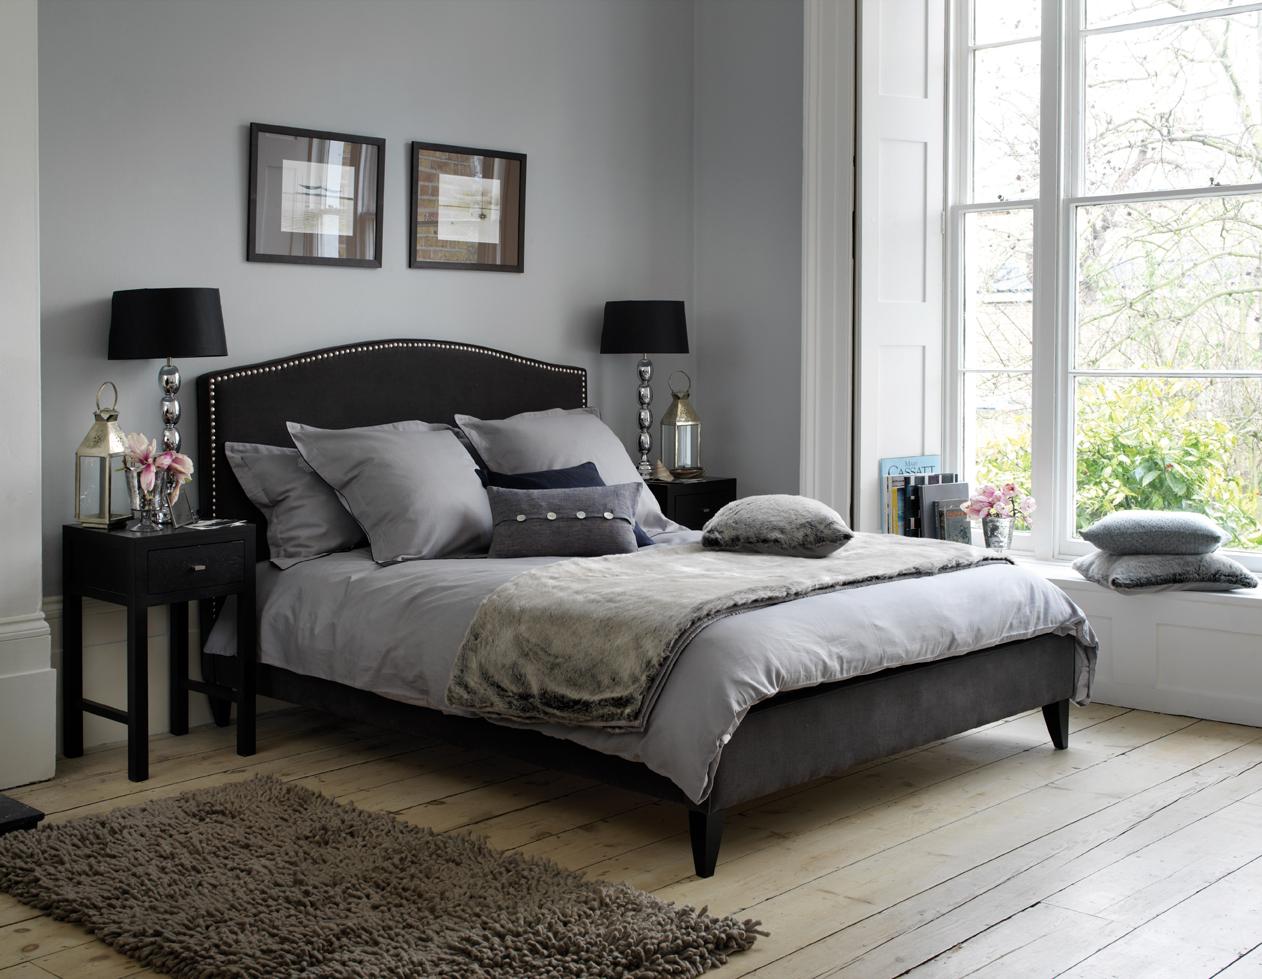 grey and black bedroom design photo - 9